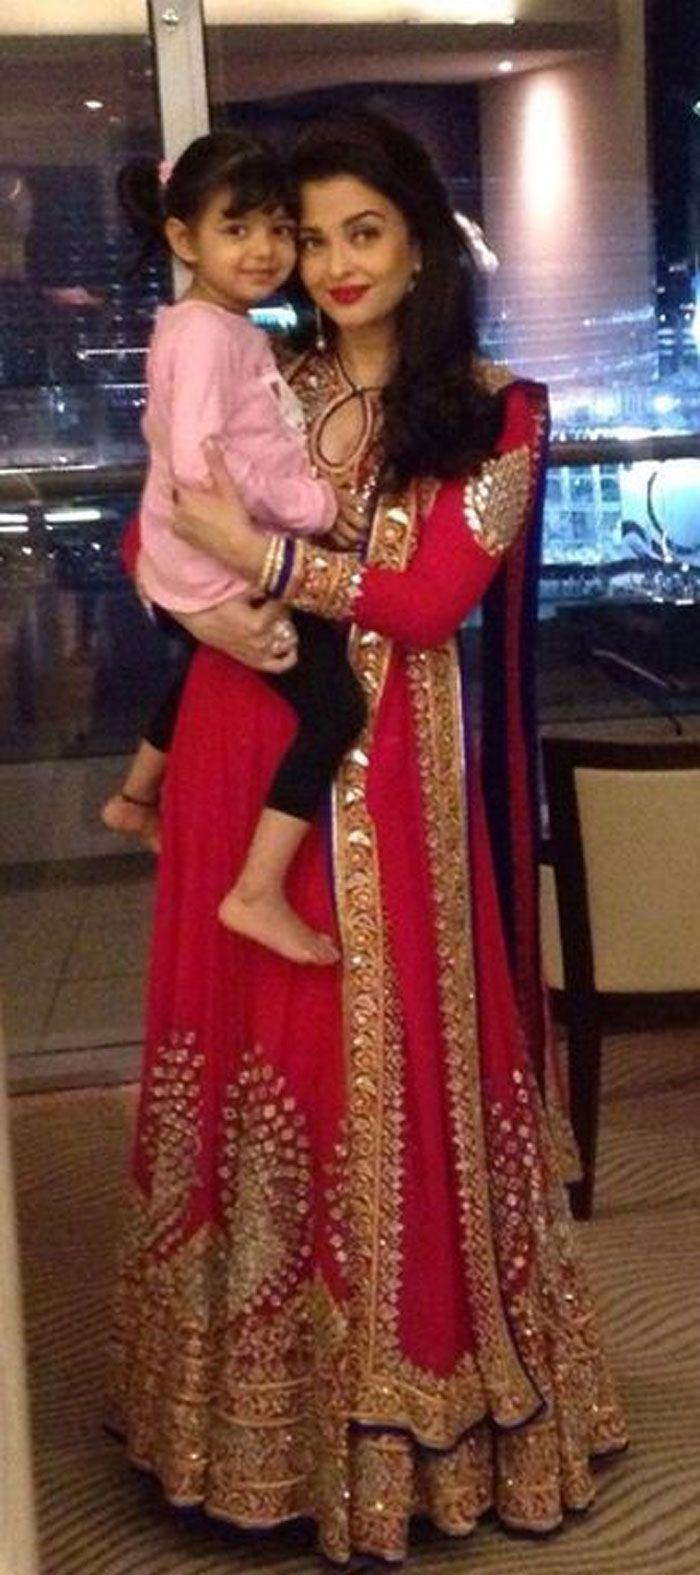 Aishwarya Rai Bachchan and birthday girl Aaradhya were in Dubai